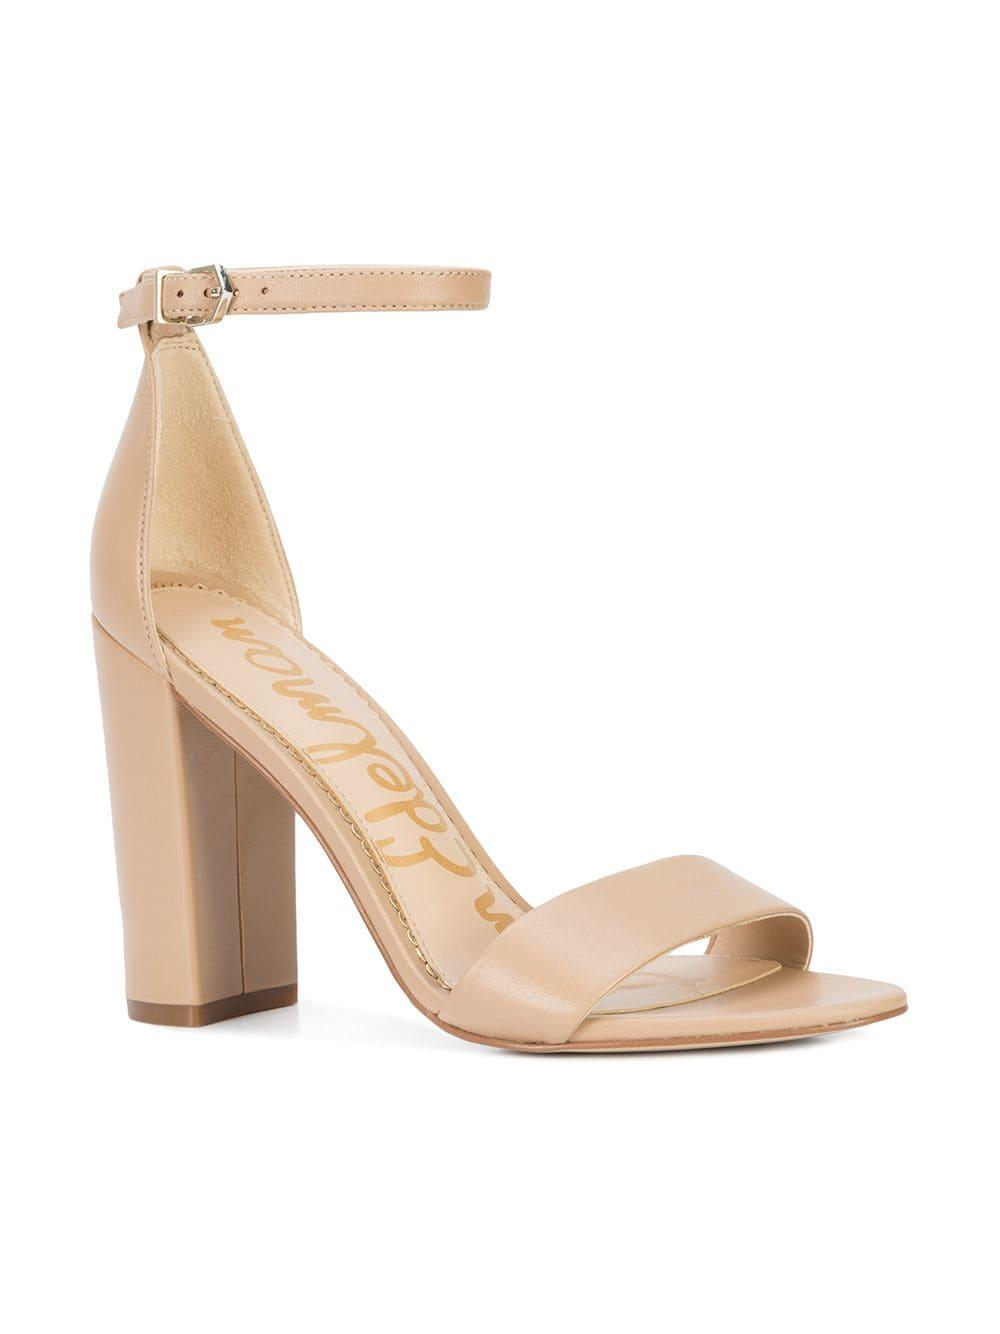 f219fd2e644 Lyst - Sam Edelman Block Heel Sandals in Natural